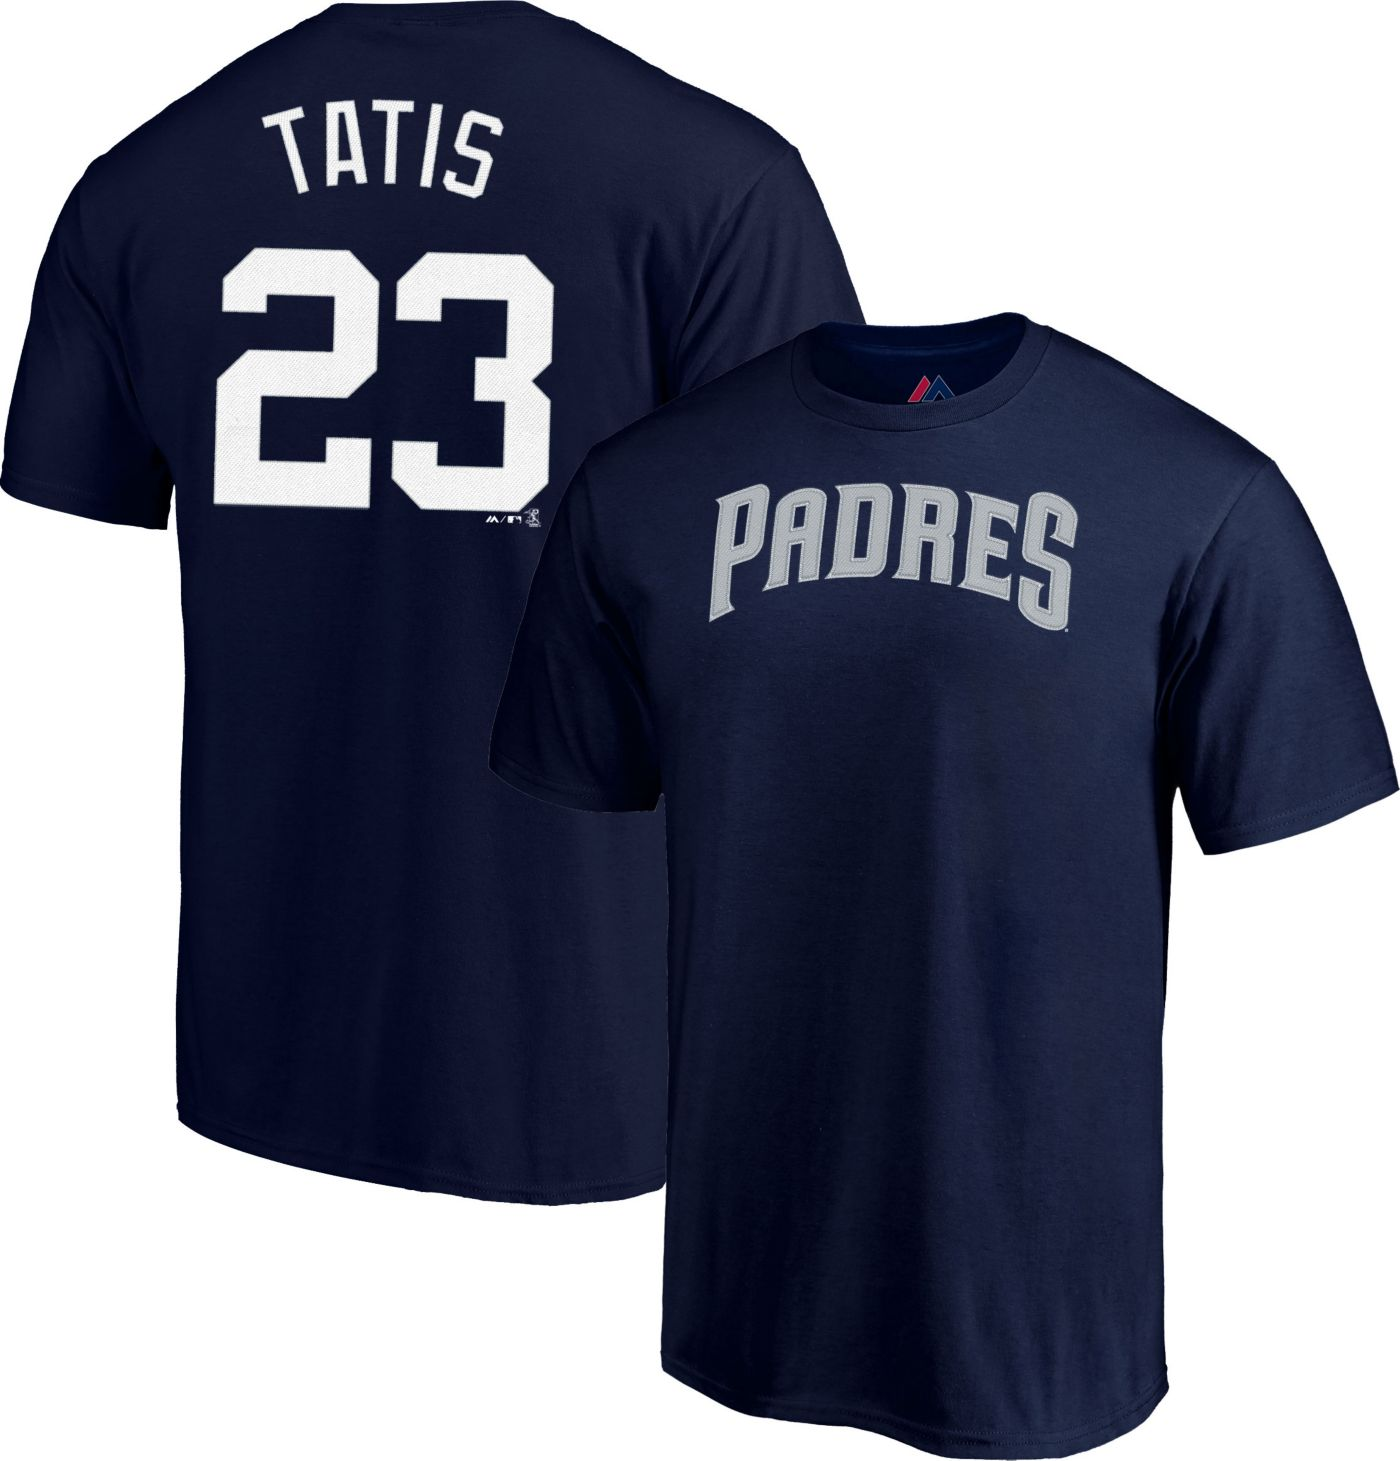 Majestic Youth San Diego Padres Fernando Tatis Jr. #23 Navy T-Shirt